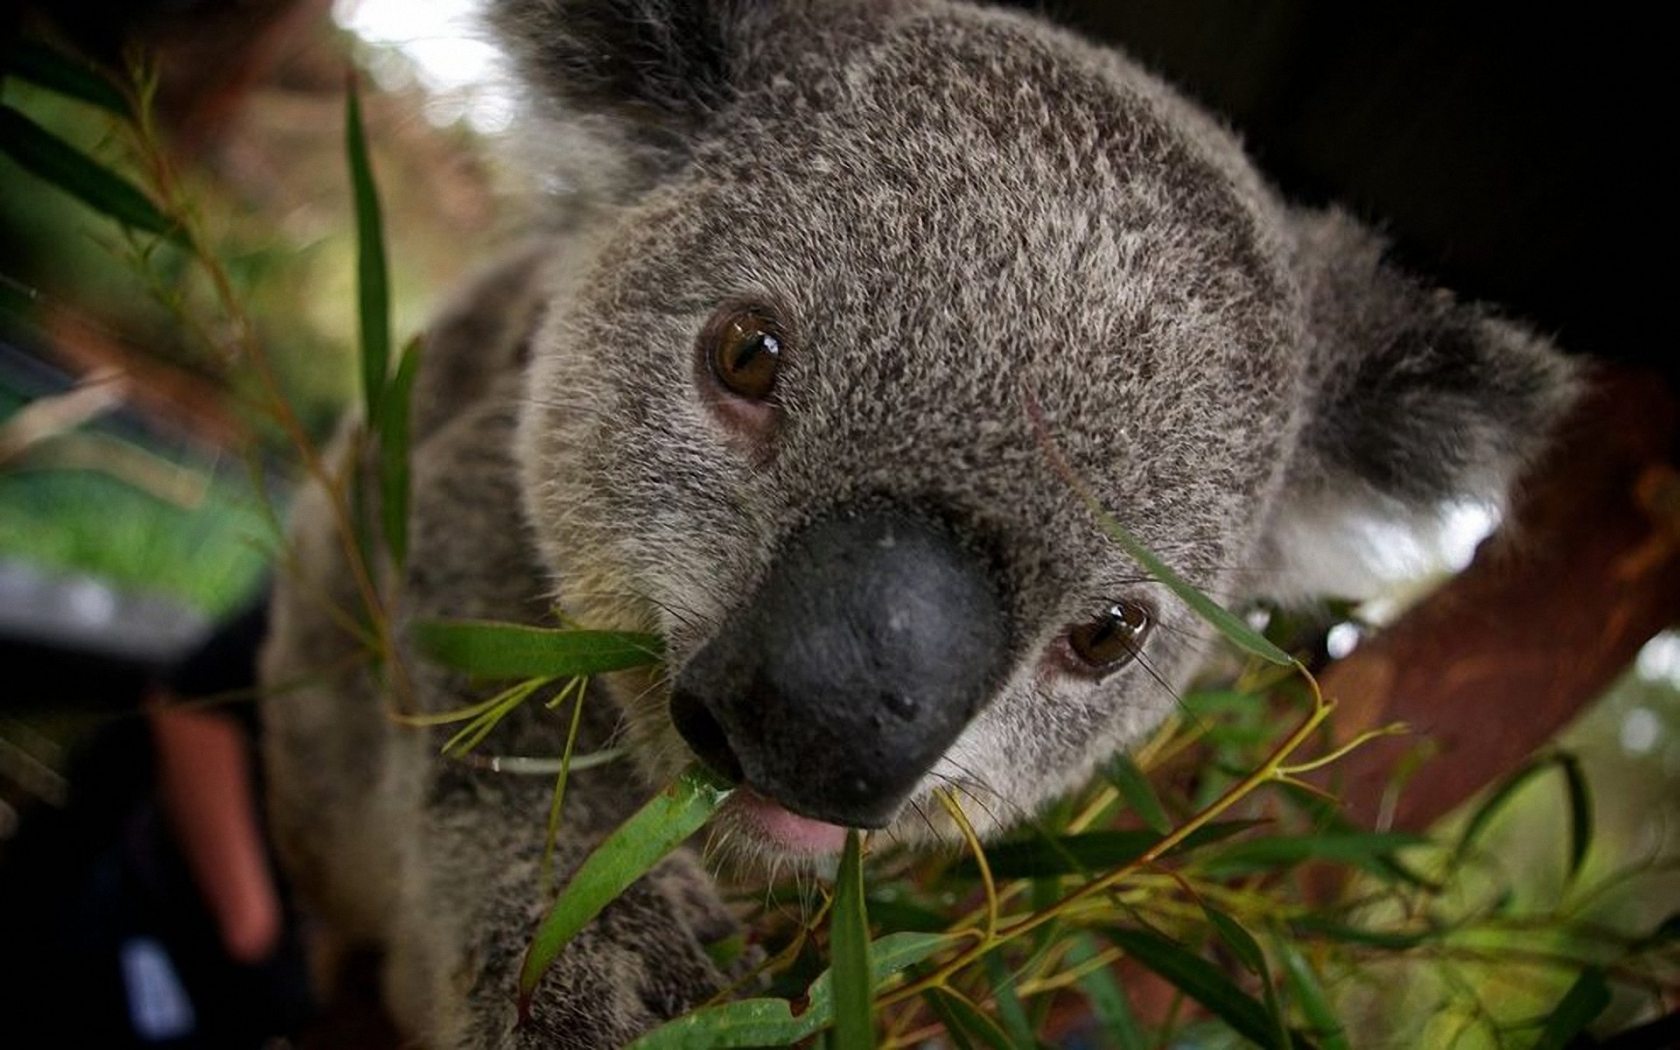 Koala 1680x1050 Wallpapers, 1680x1050 Wallpapers ...